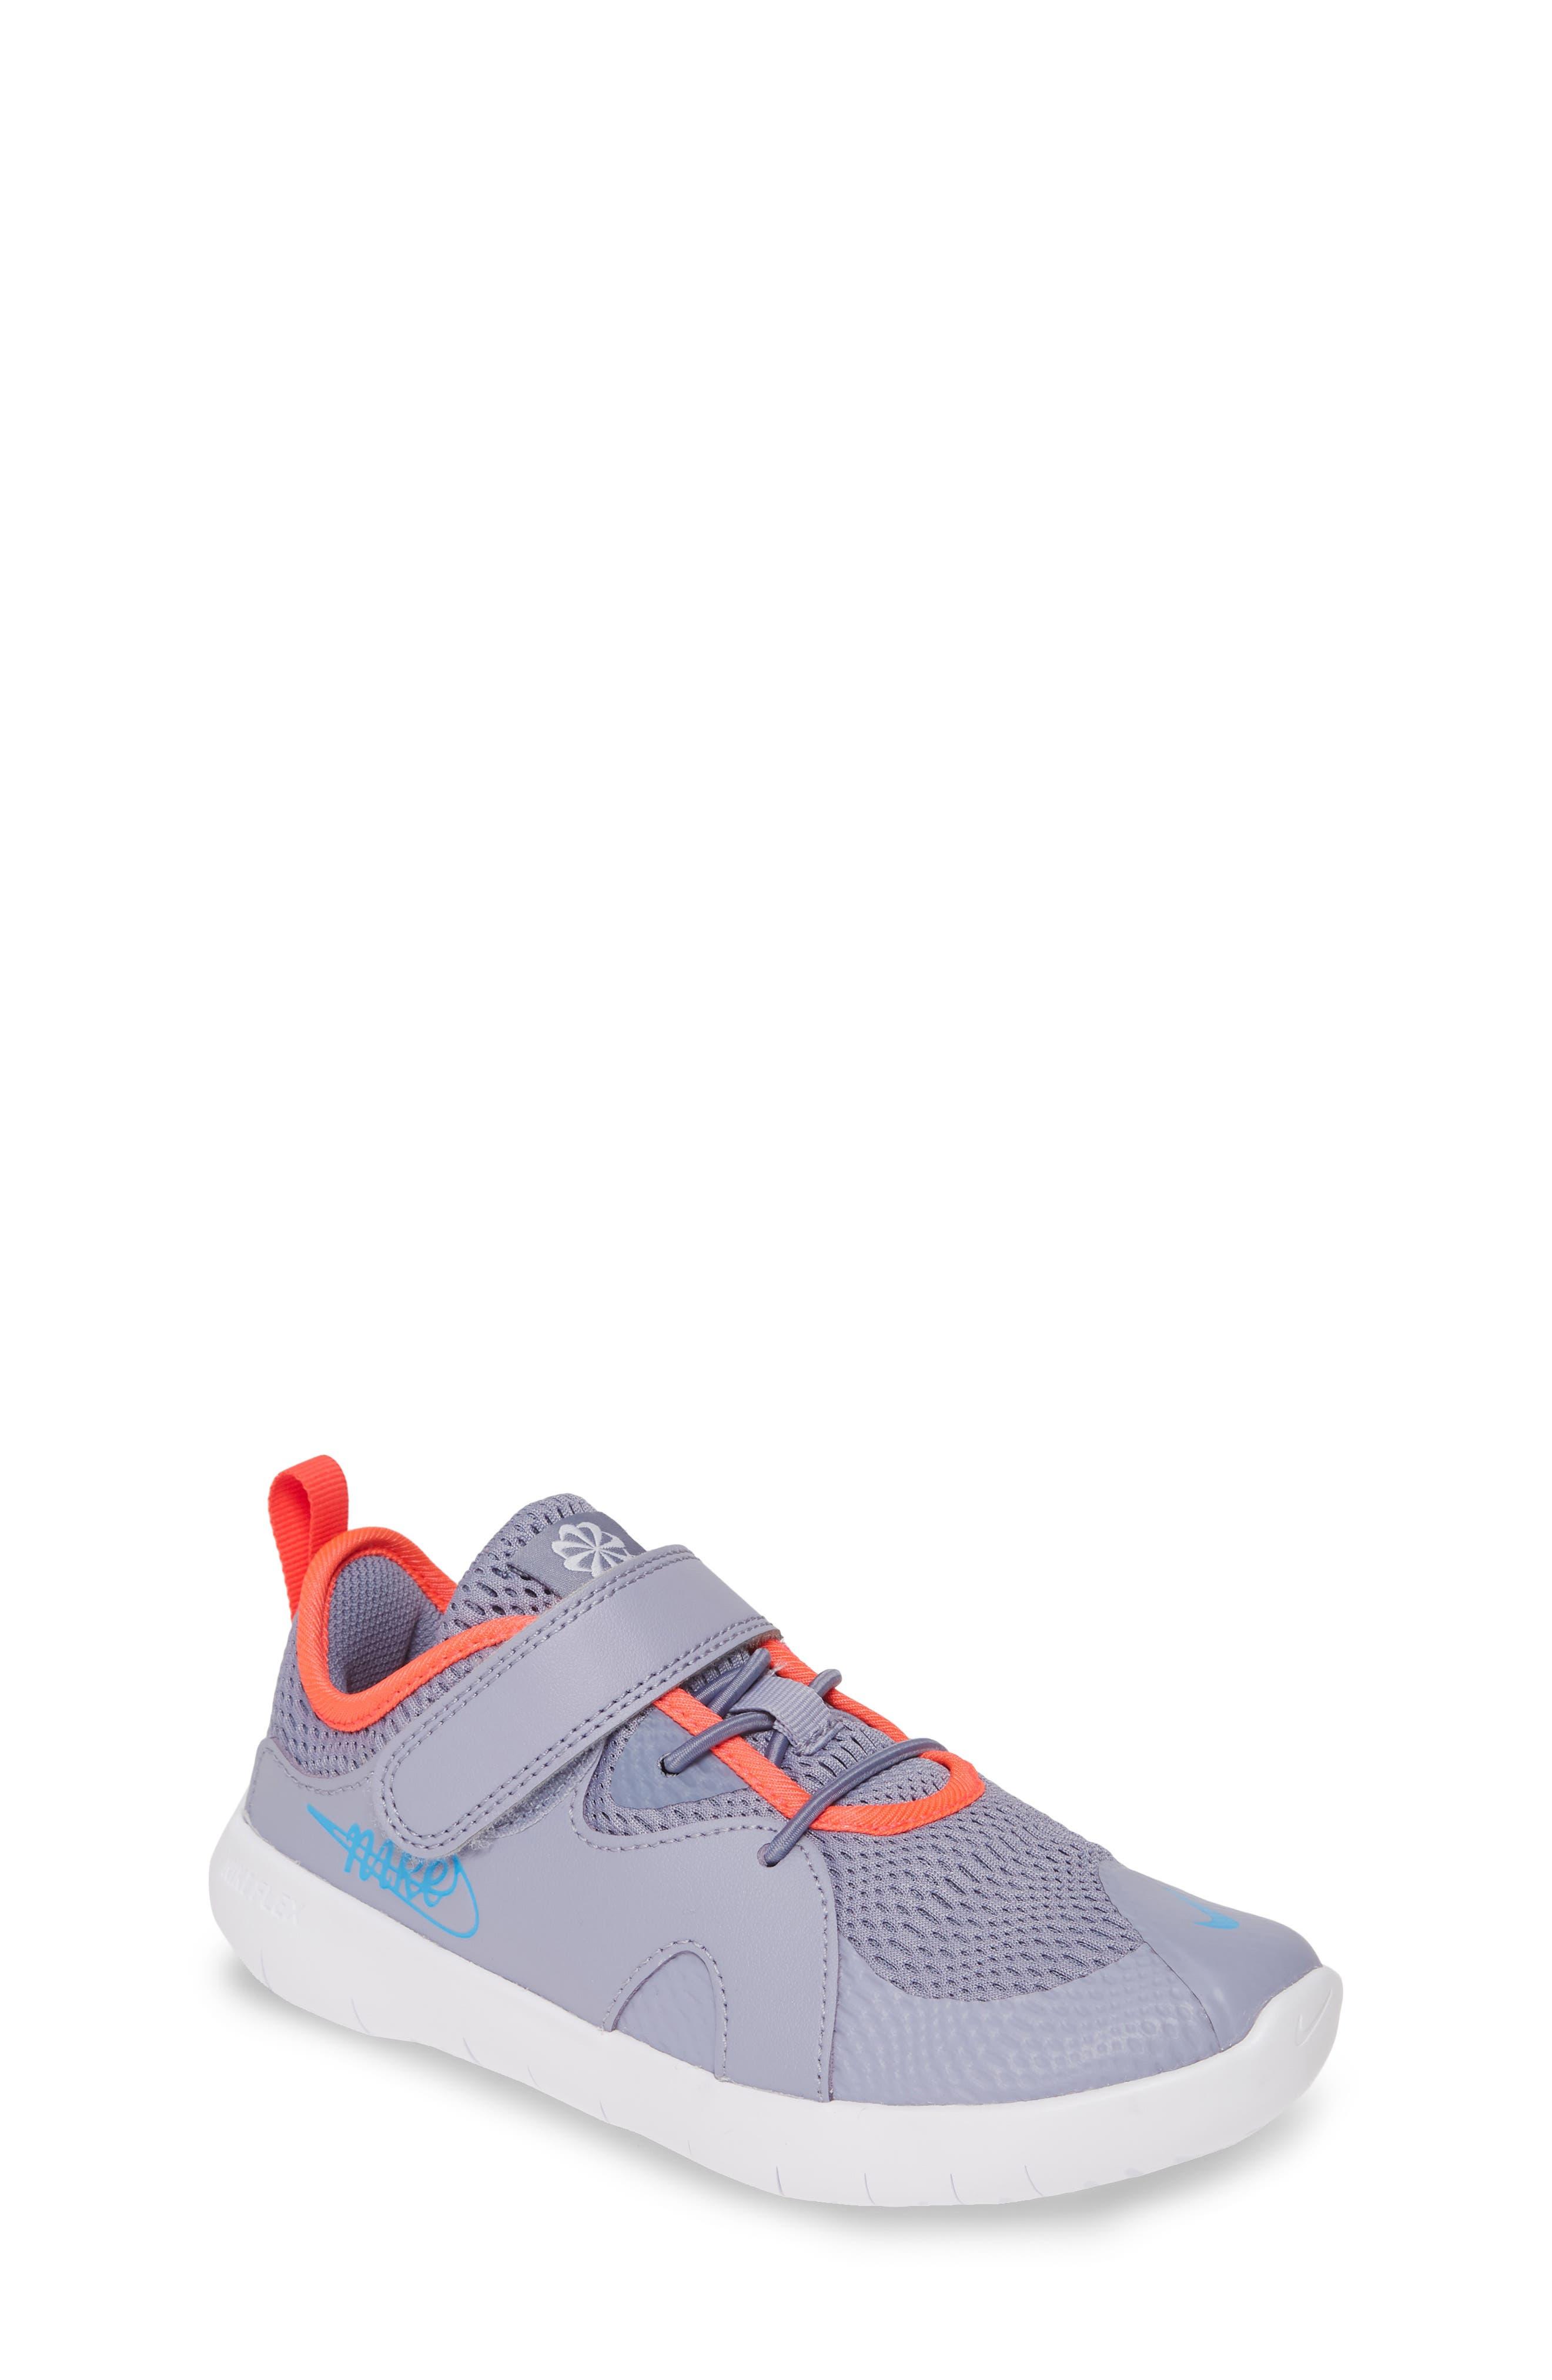 Nike Flex Contact 3 Jdi Disrupt Running Shoe